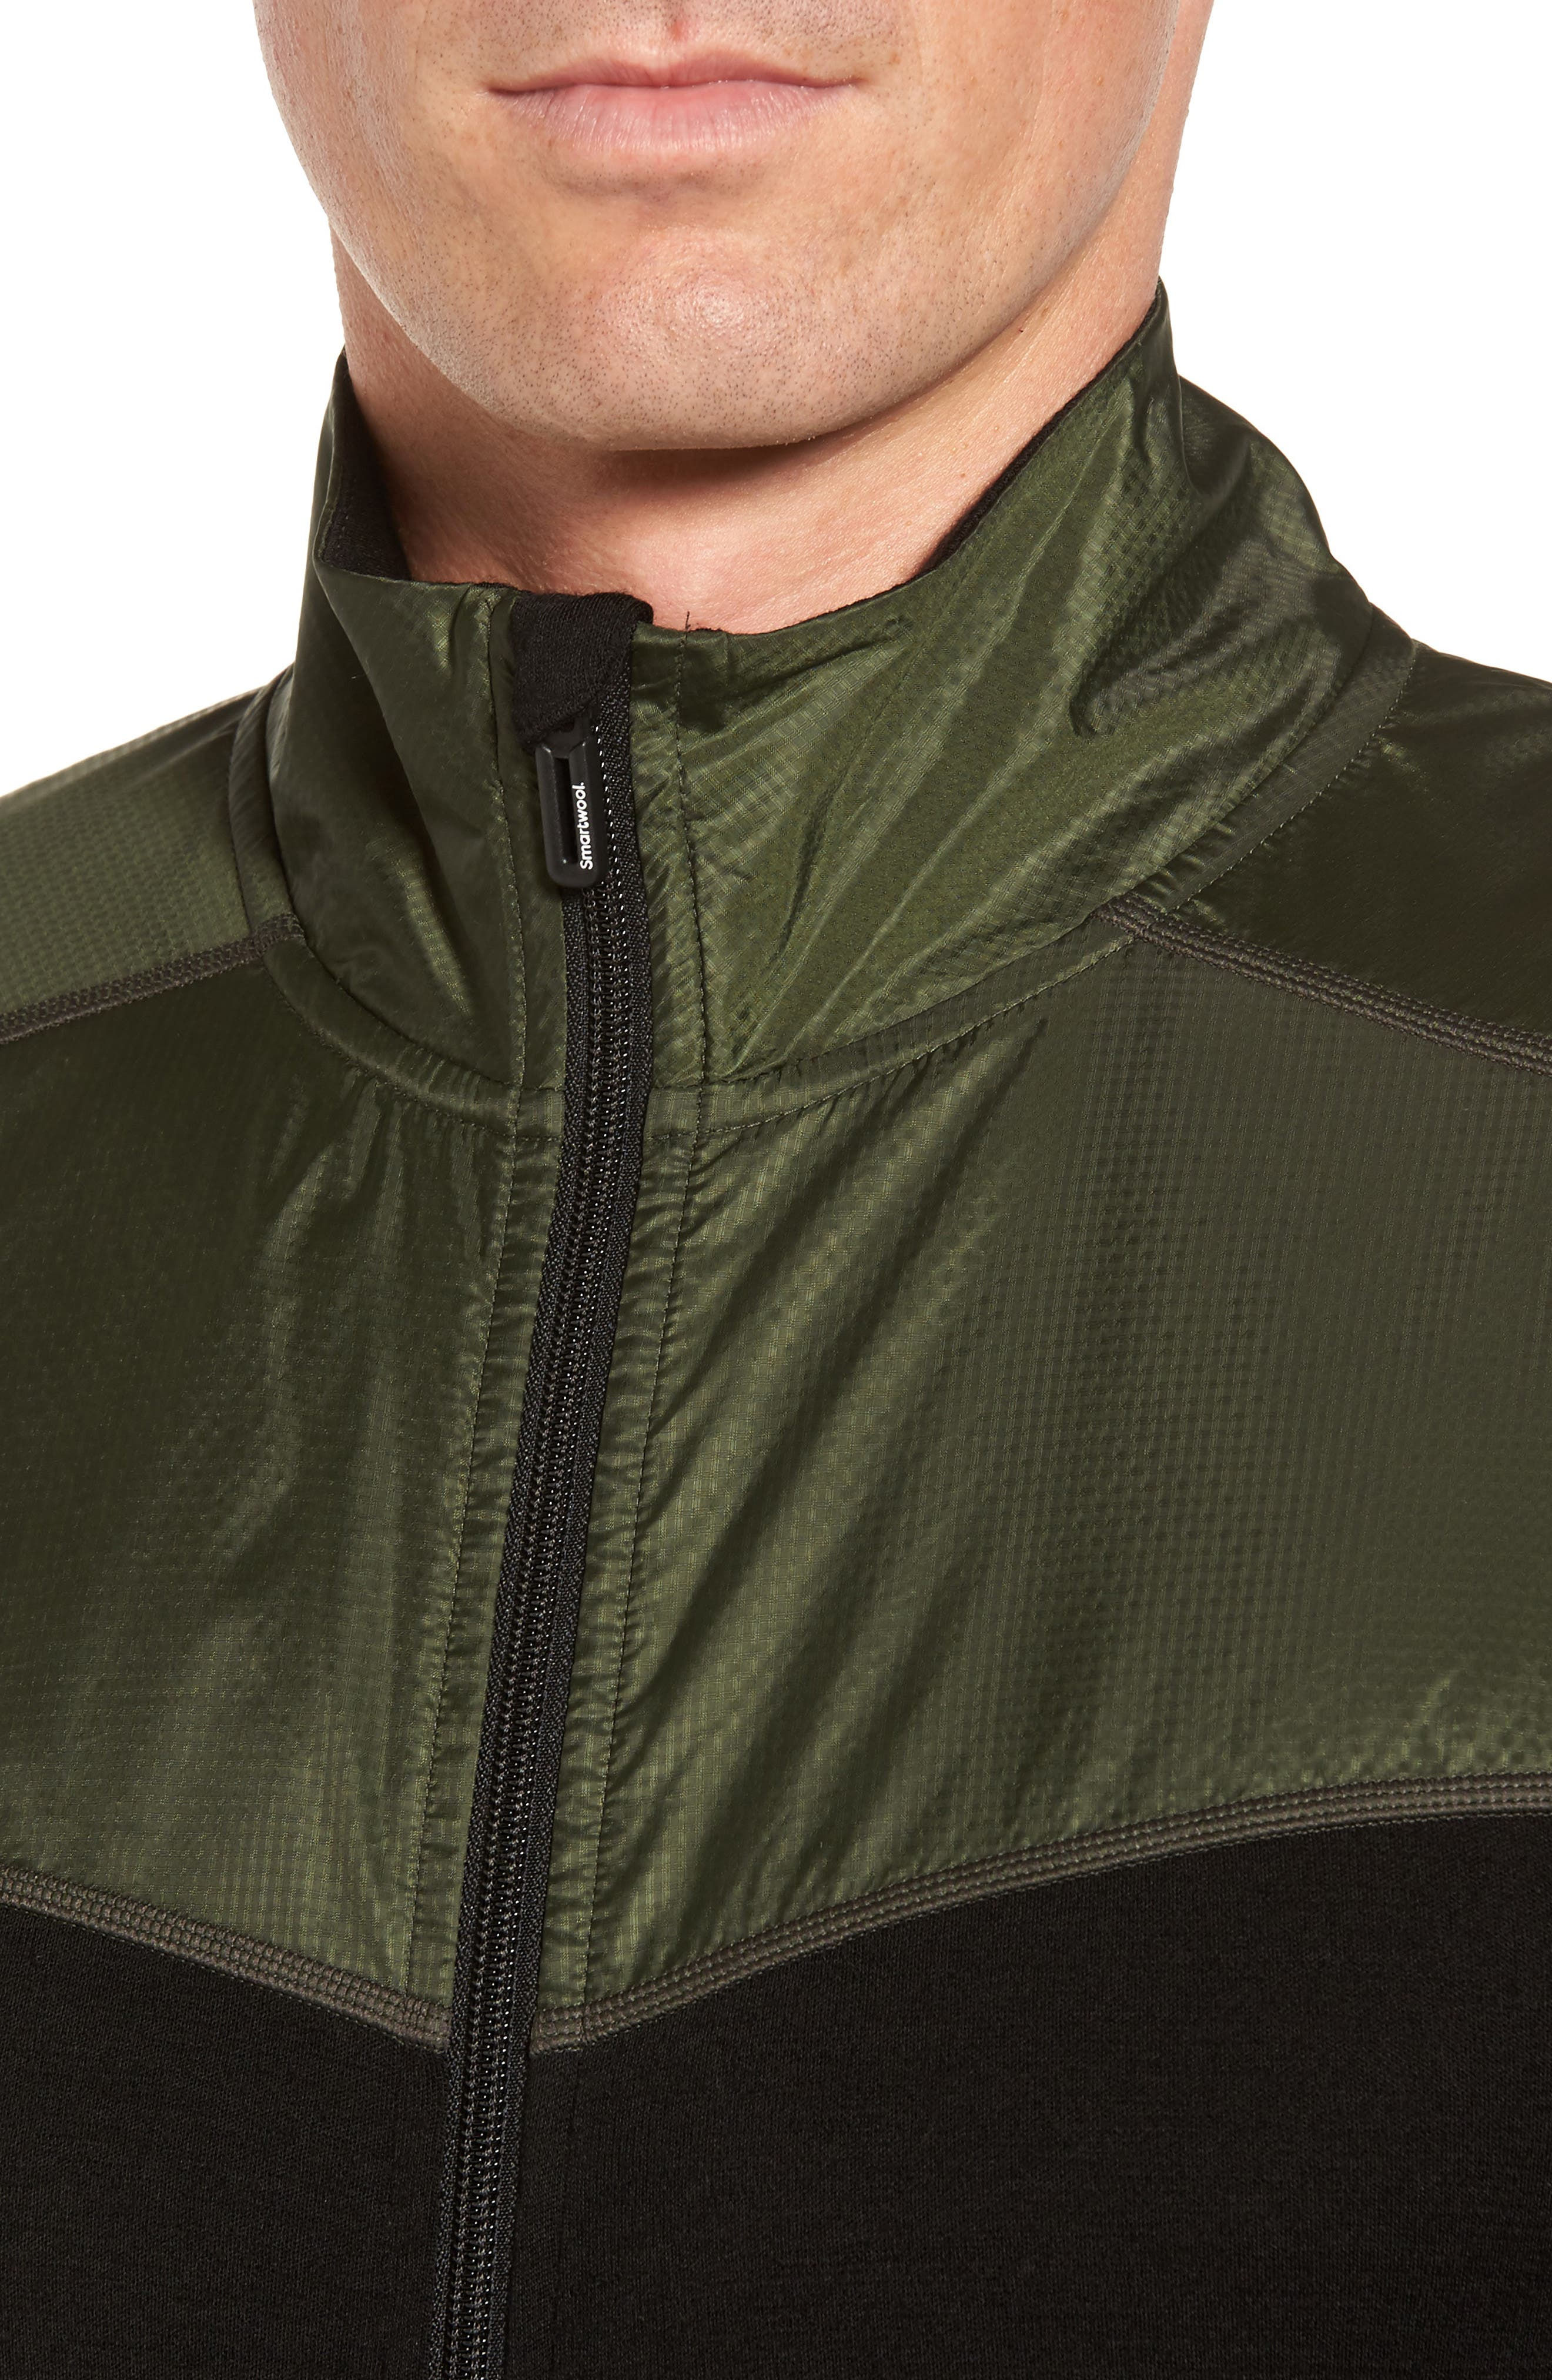 250 Sport Merino Wool Zip Jacket,                             Alternate thumbnail 4, color,                             301